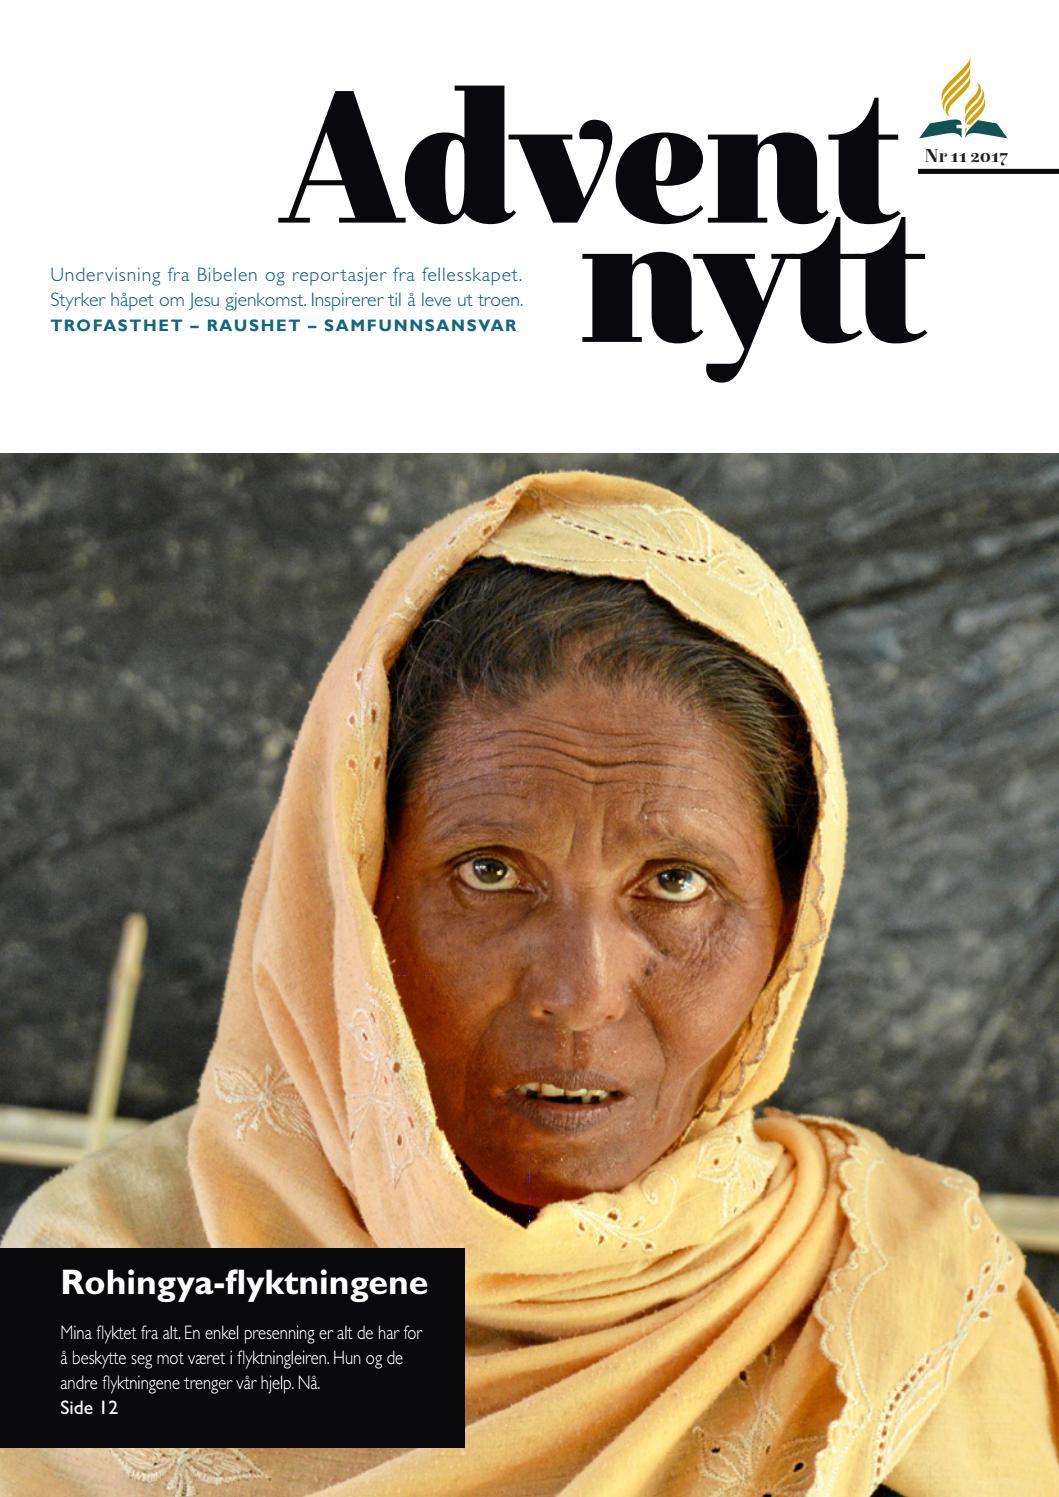 a3ae1424 Adventnytt 11 2017 by Syvendedags Adventistkirken - issuu